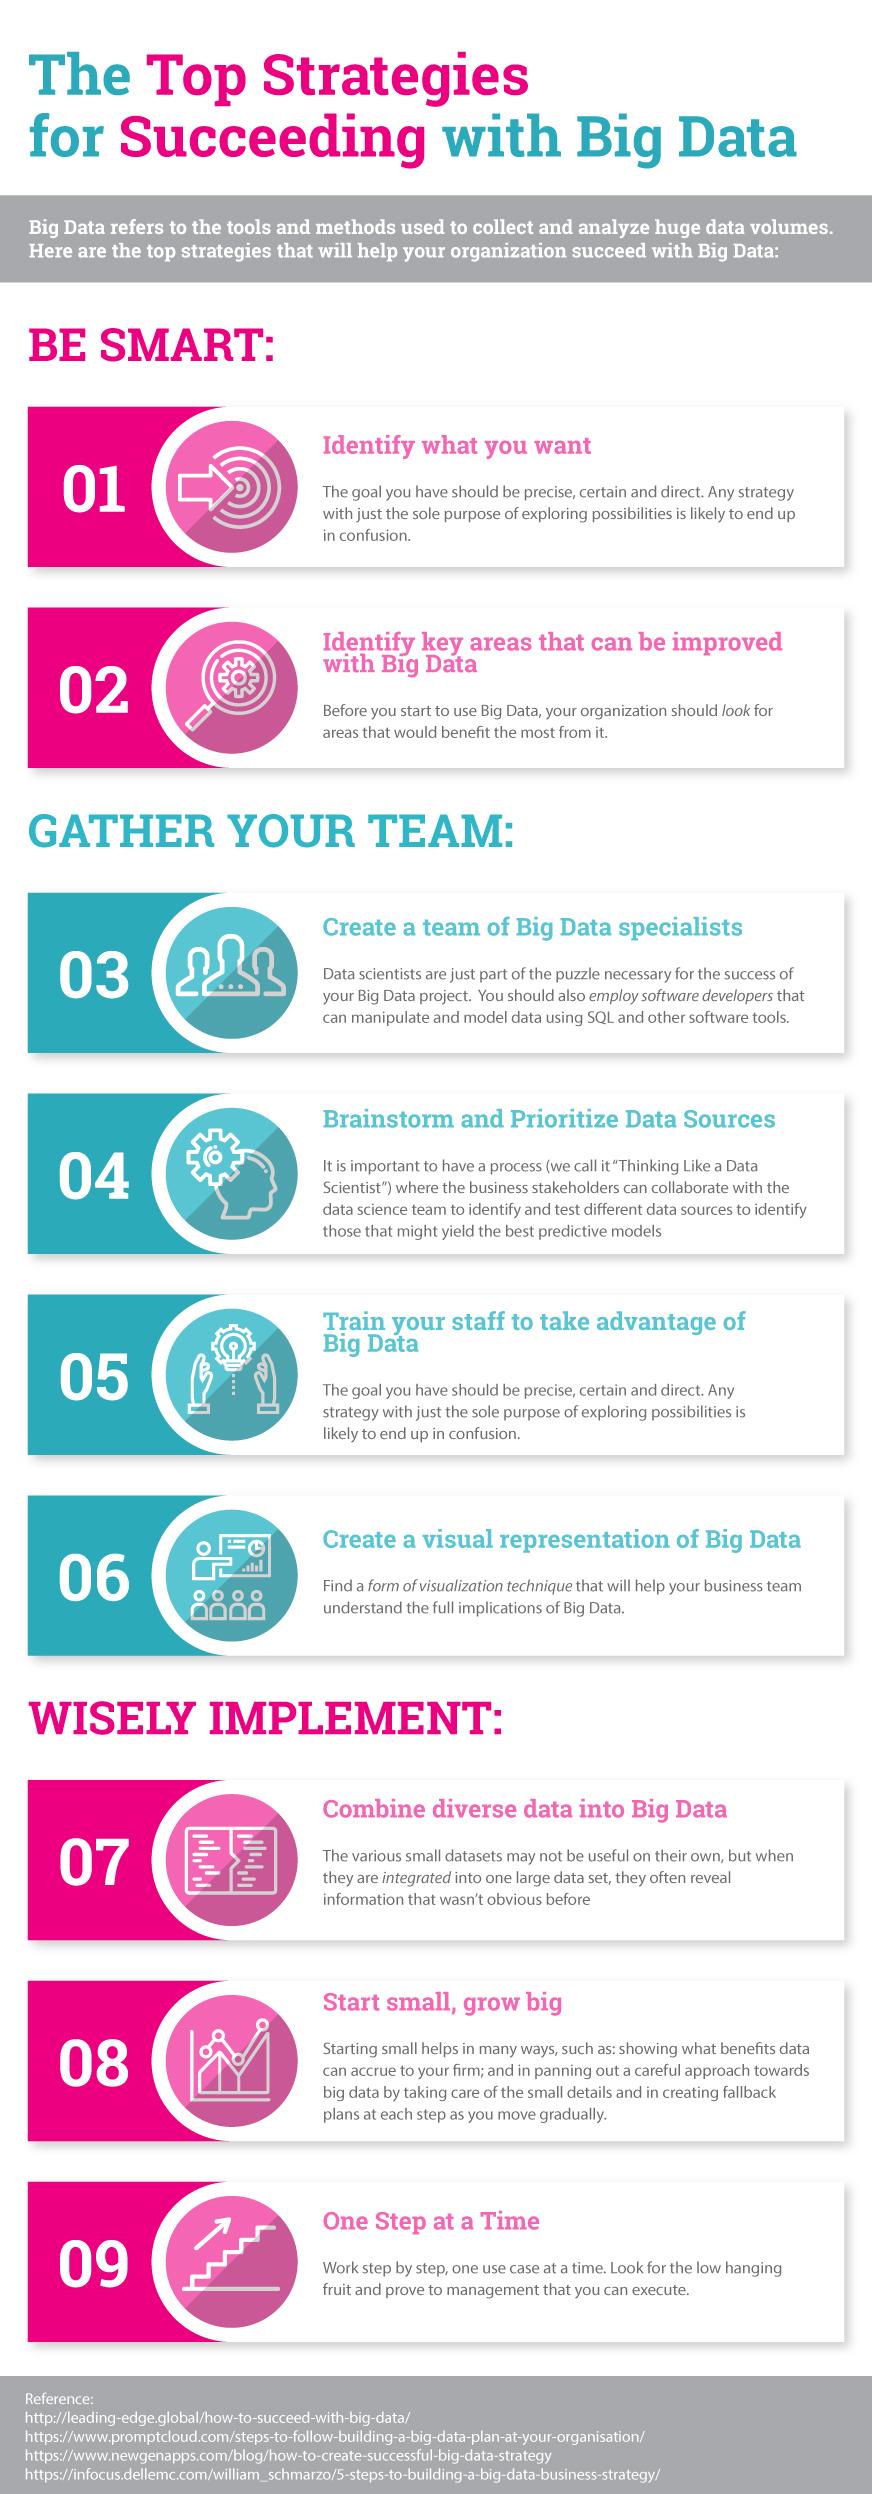 Big_Data_Strategies_for_Success.jpg